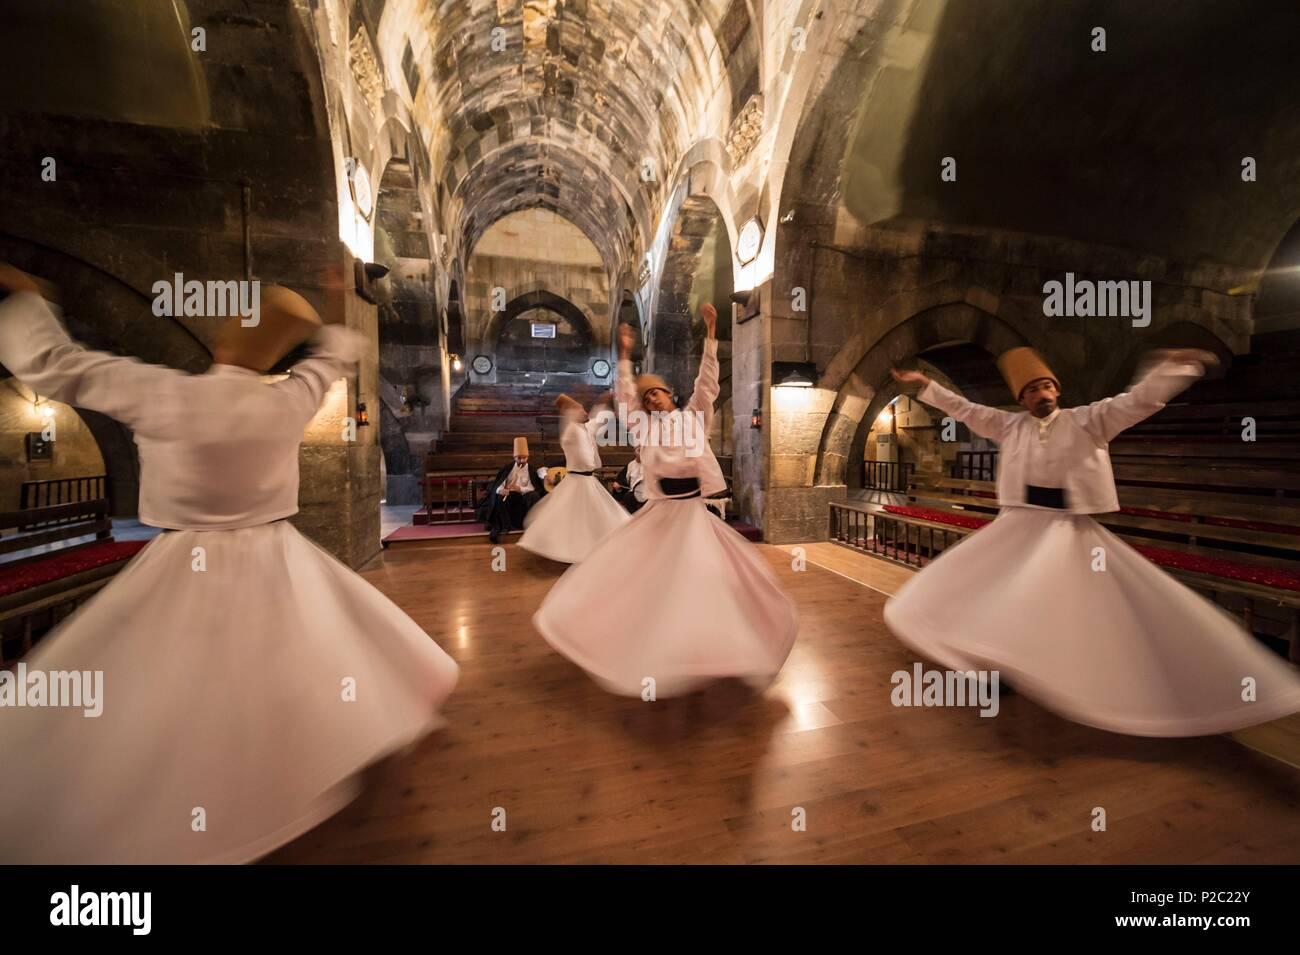 Turkey, Central Anatolia, Nevşehir province, Cappadocia UNESCO World Heritage Site, Avanos, ceremony of whirling dervishes at Sarihan Seljuk caravanserai, built in 1249, on the Silk Road - Stock Image